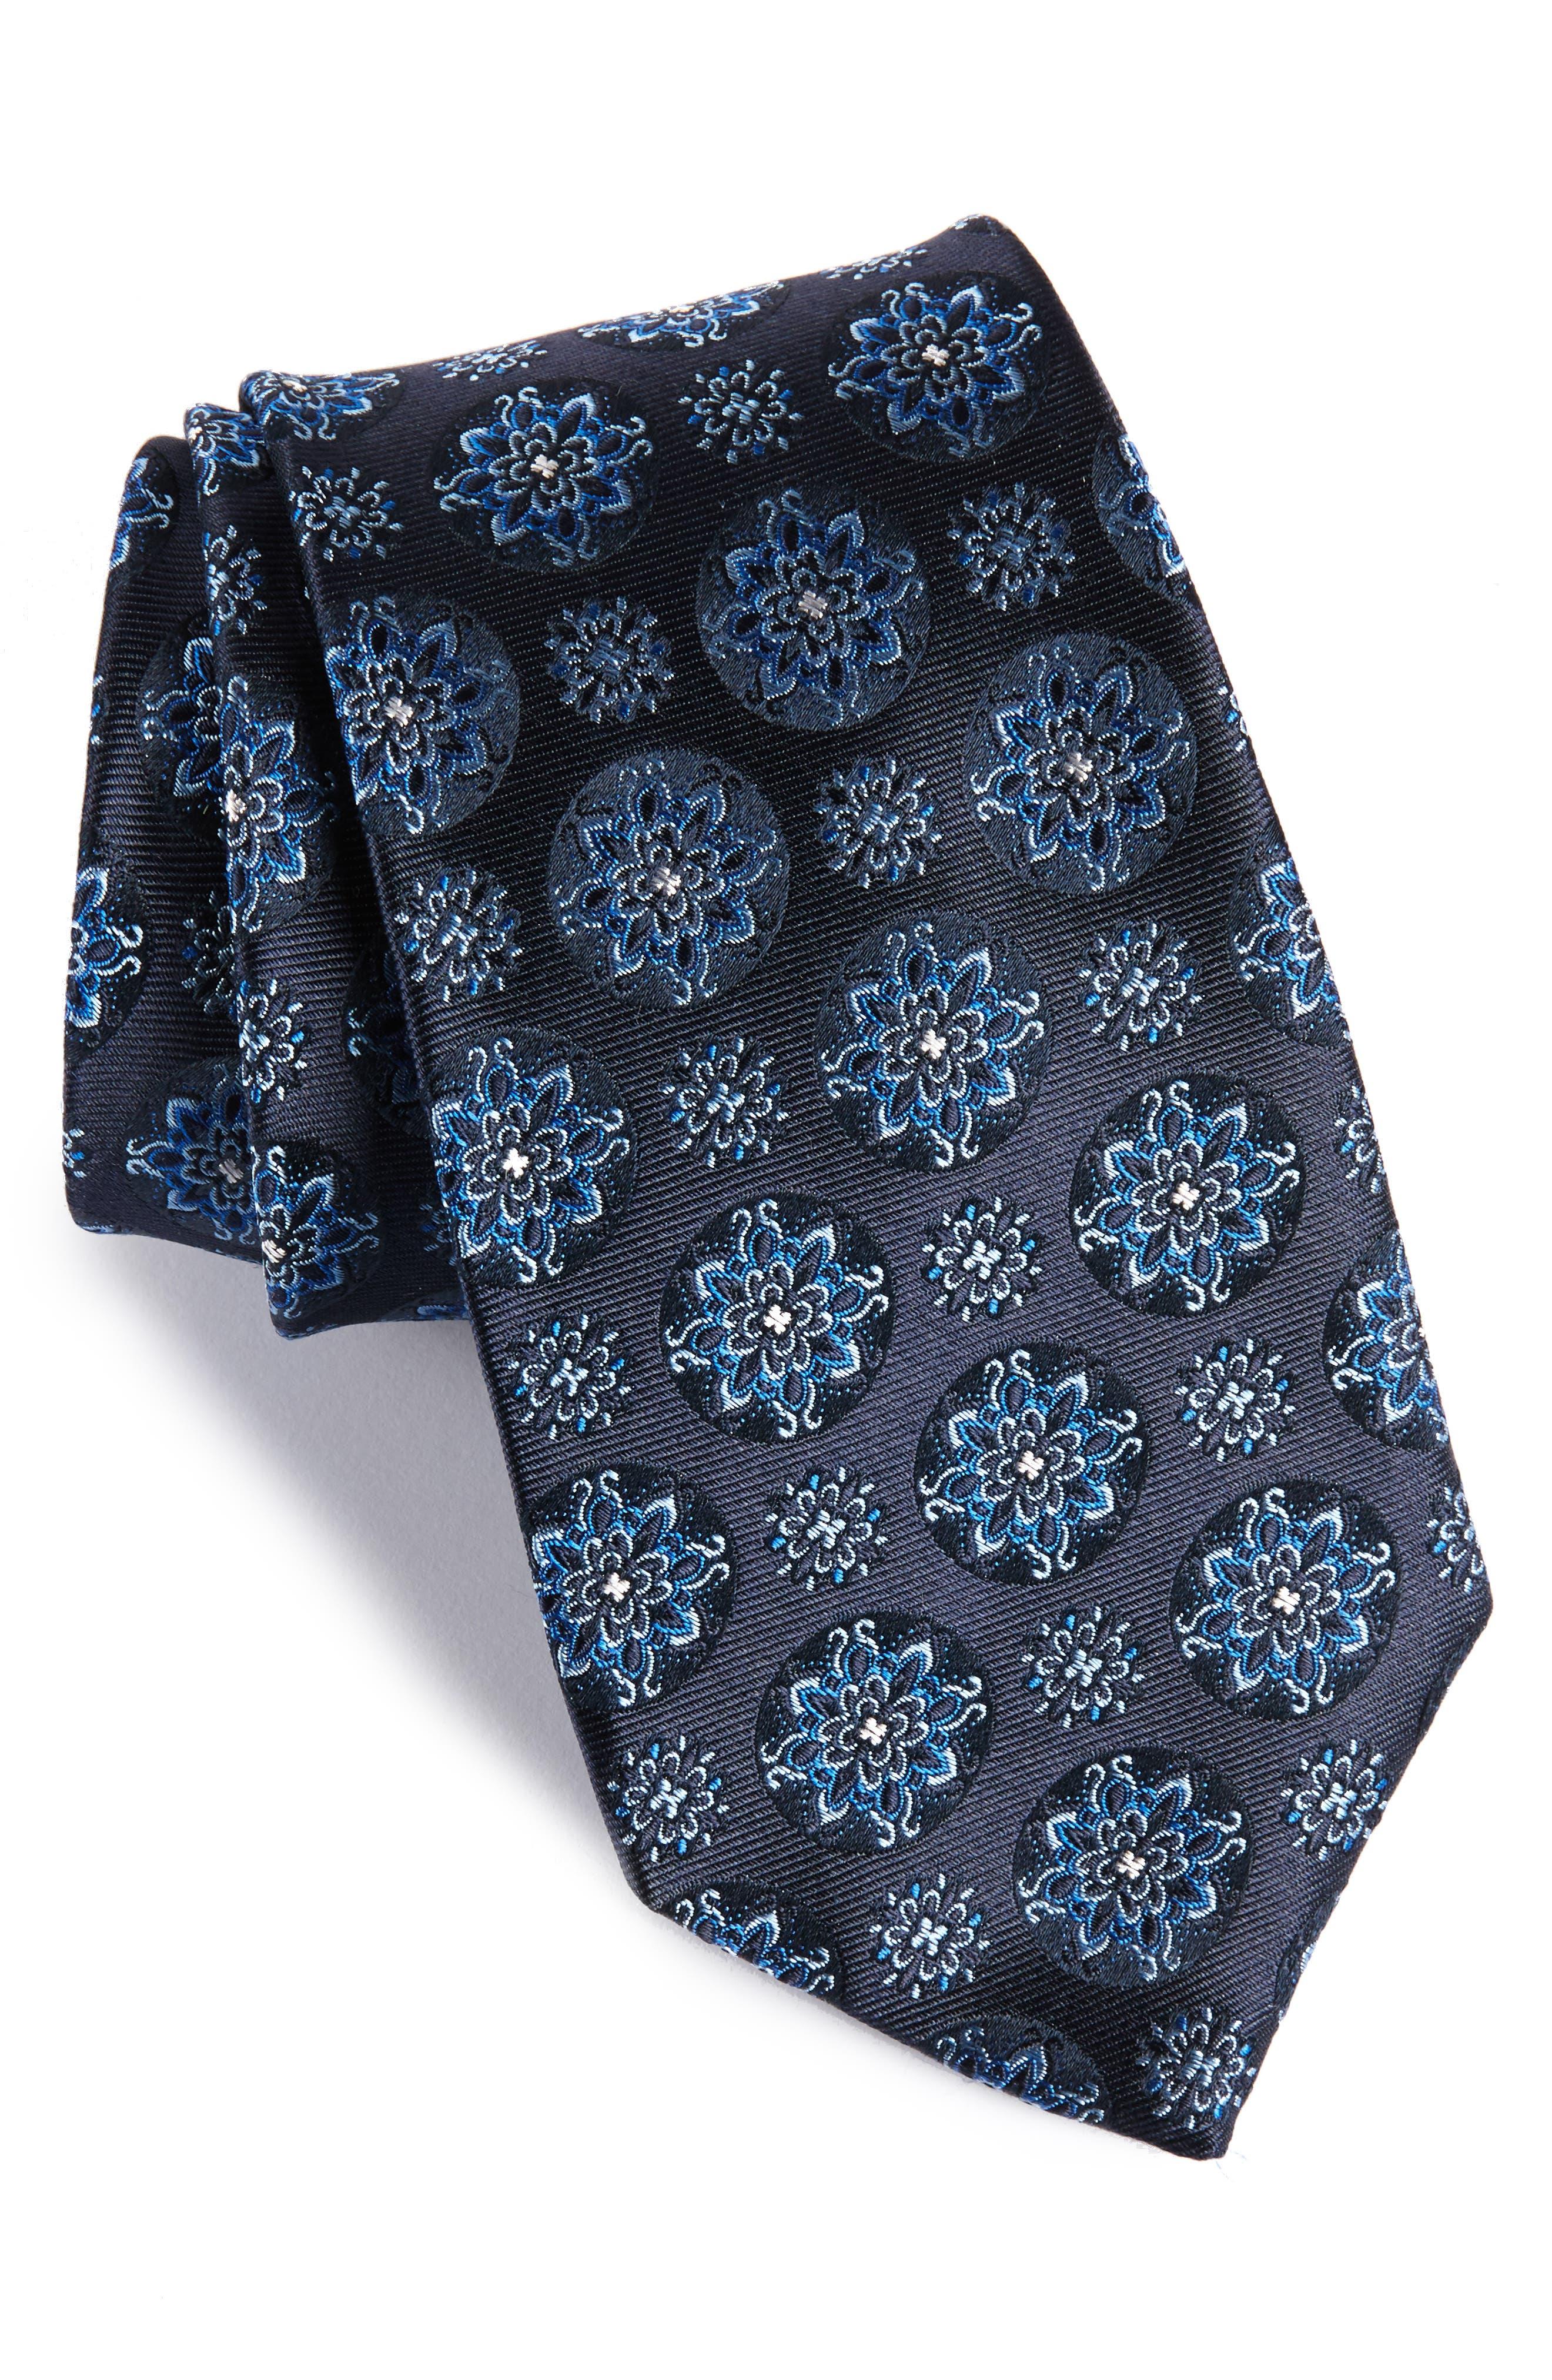 Alternate Image 1 Selected - BOSS Medallion Silk Tie